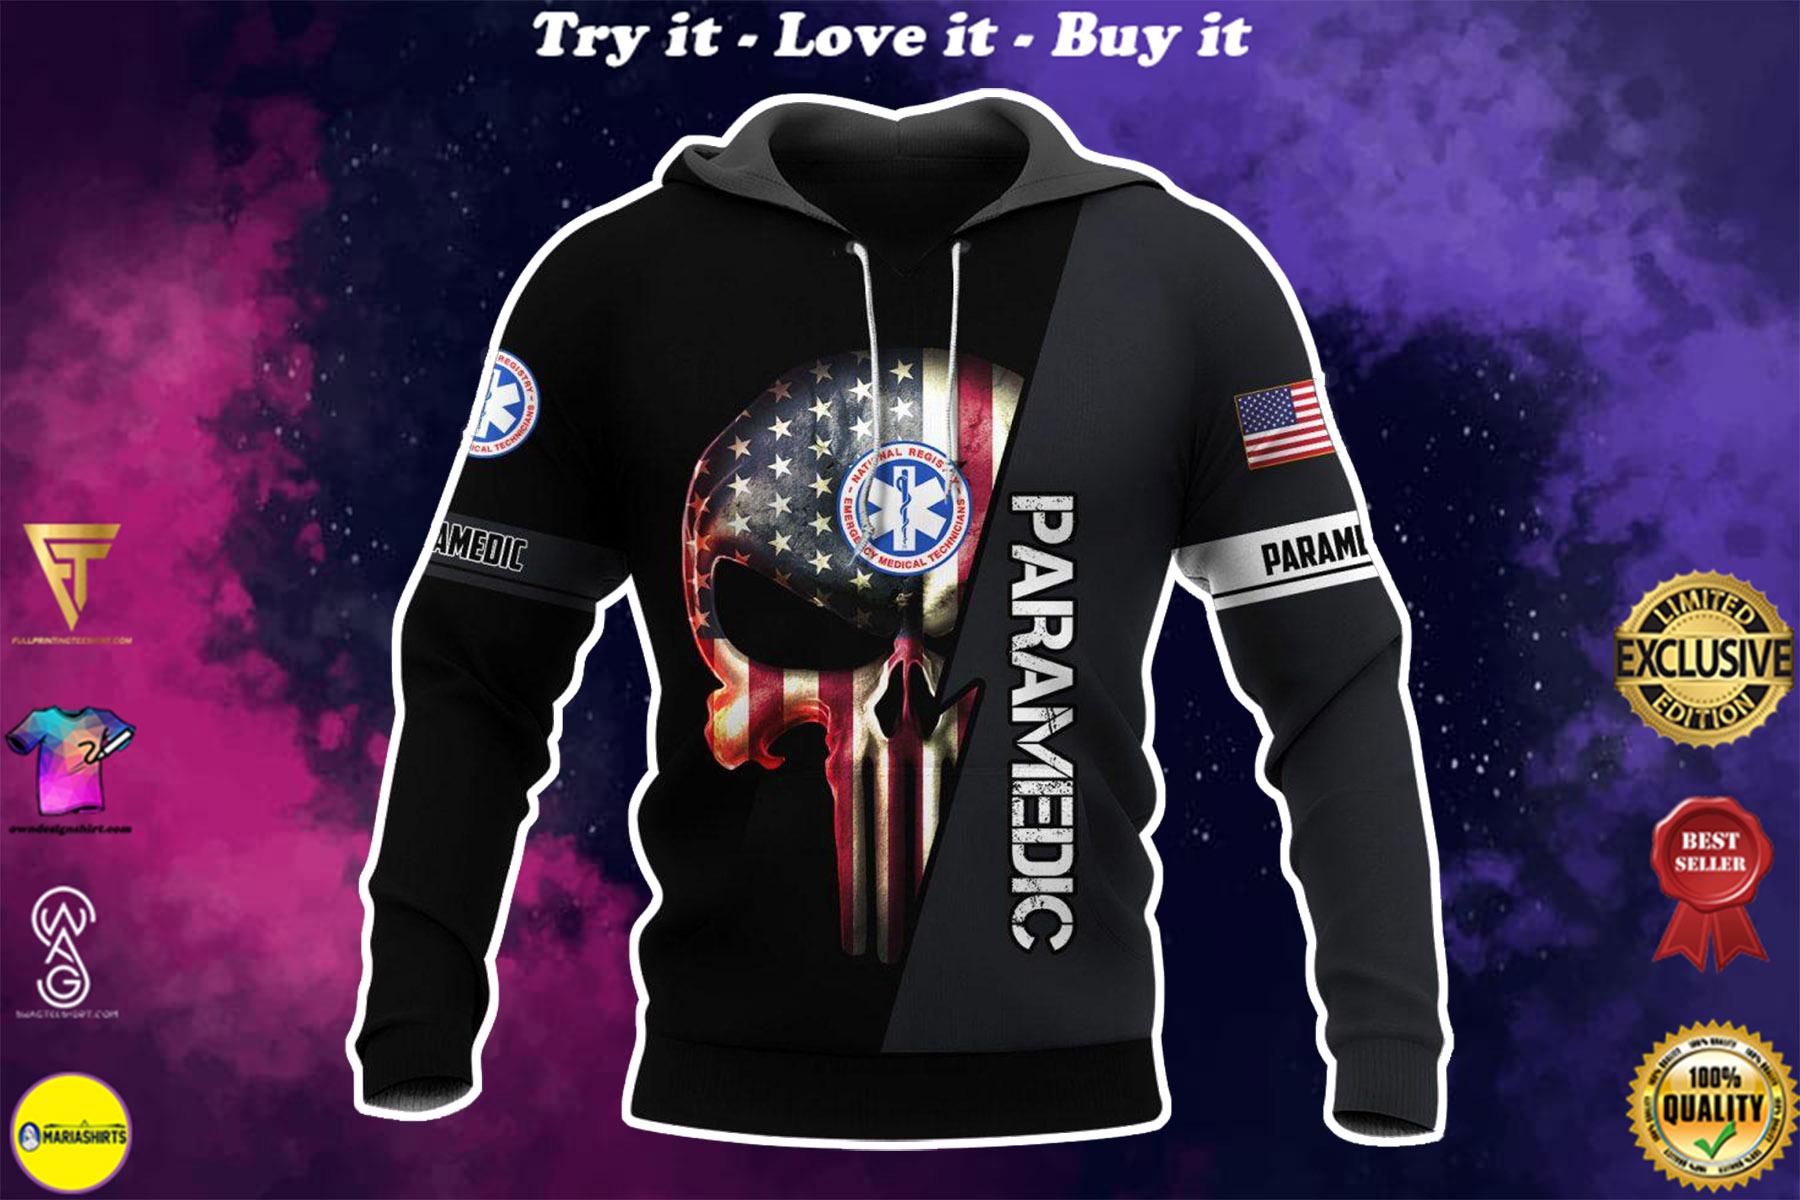 [highest selling] emt paramedic skull american flag full over printed shirt - maria